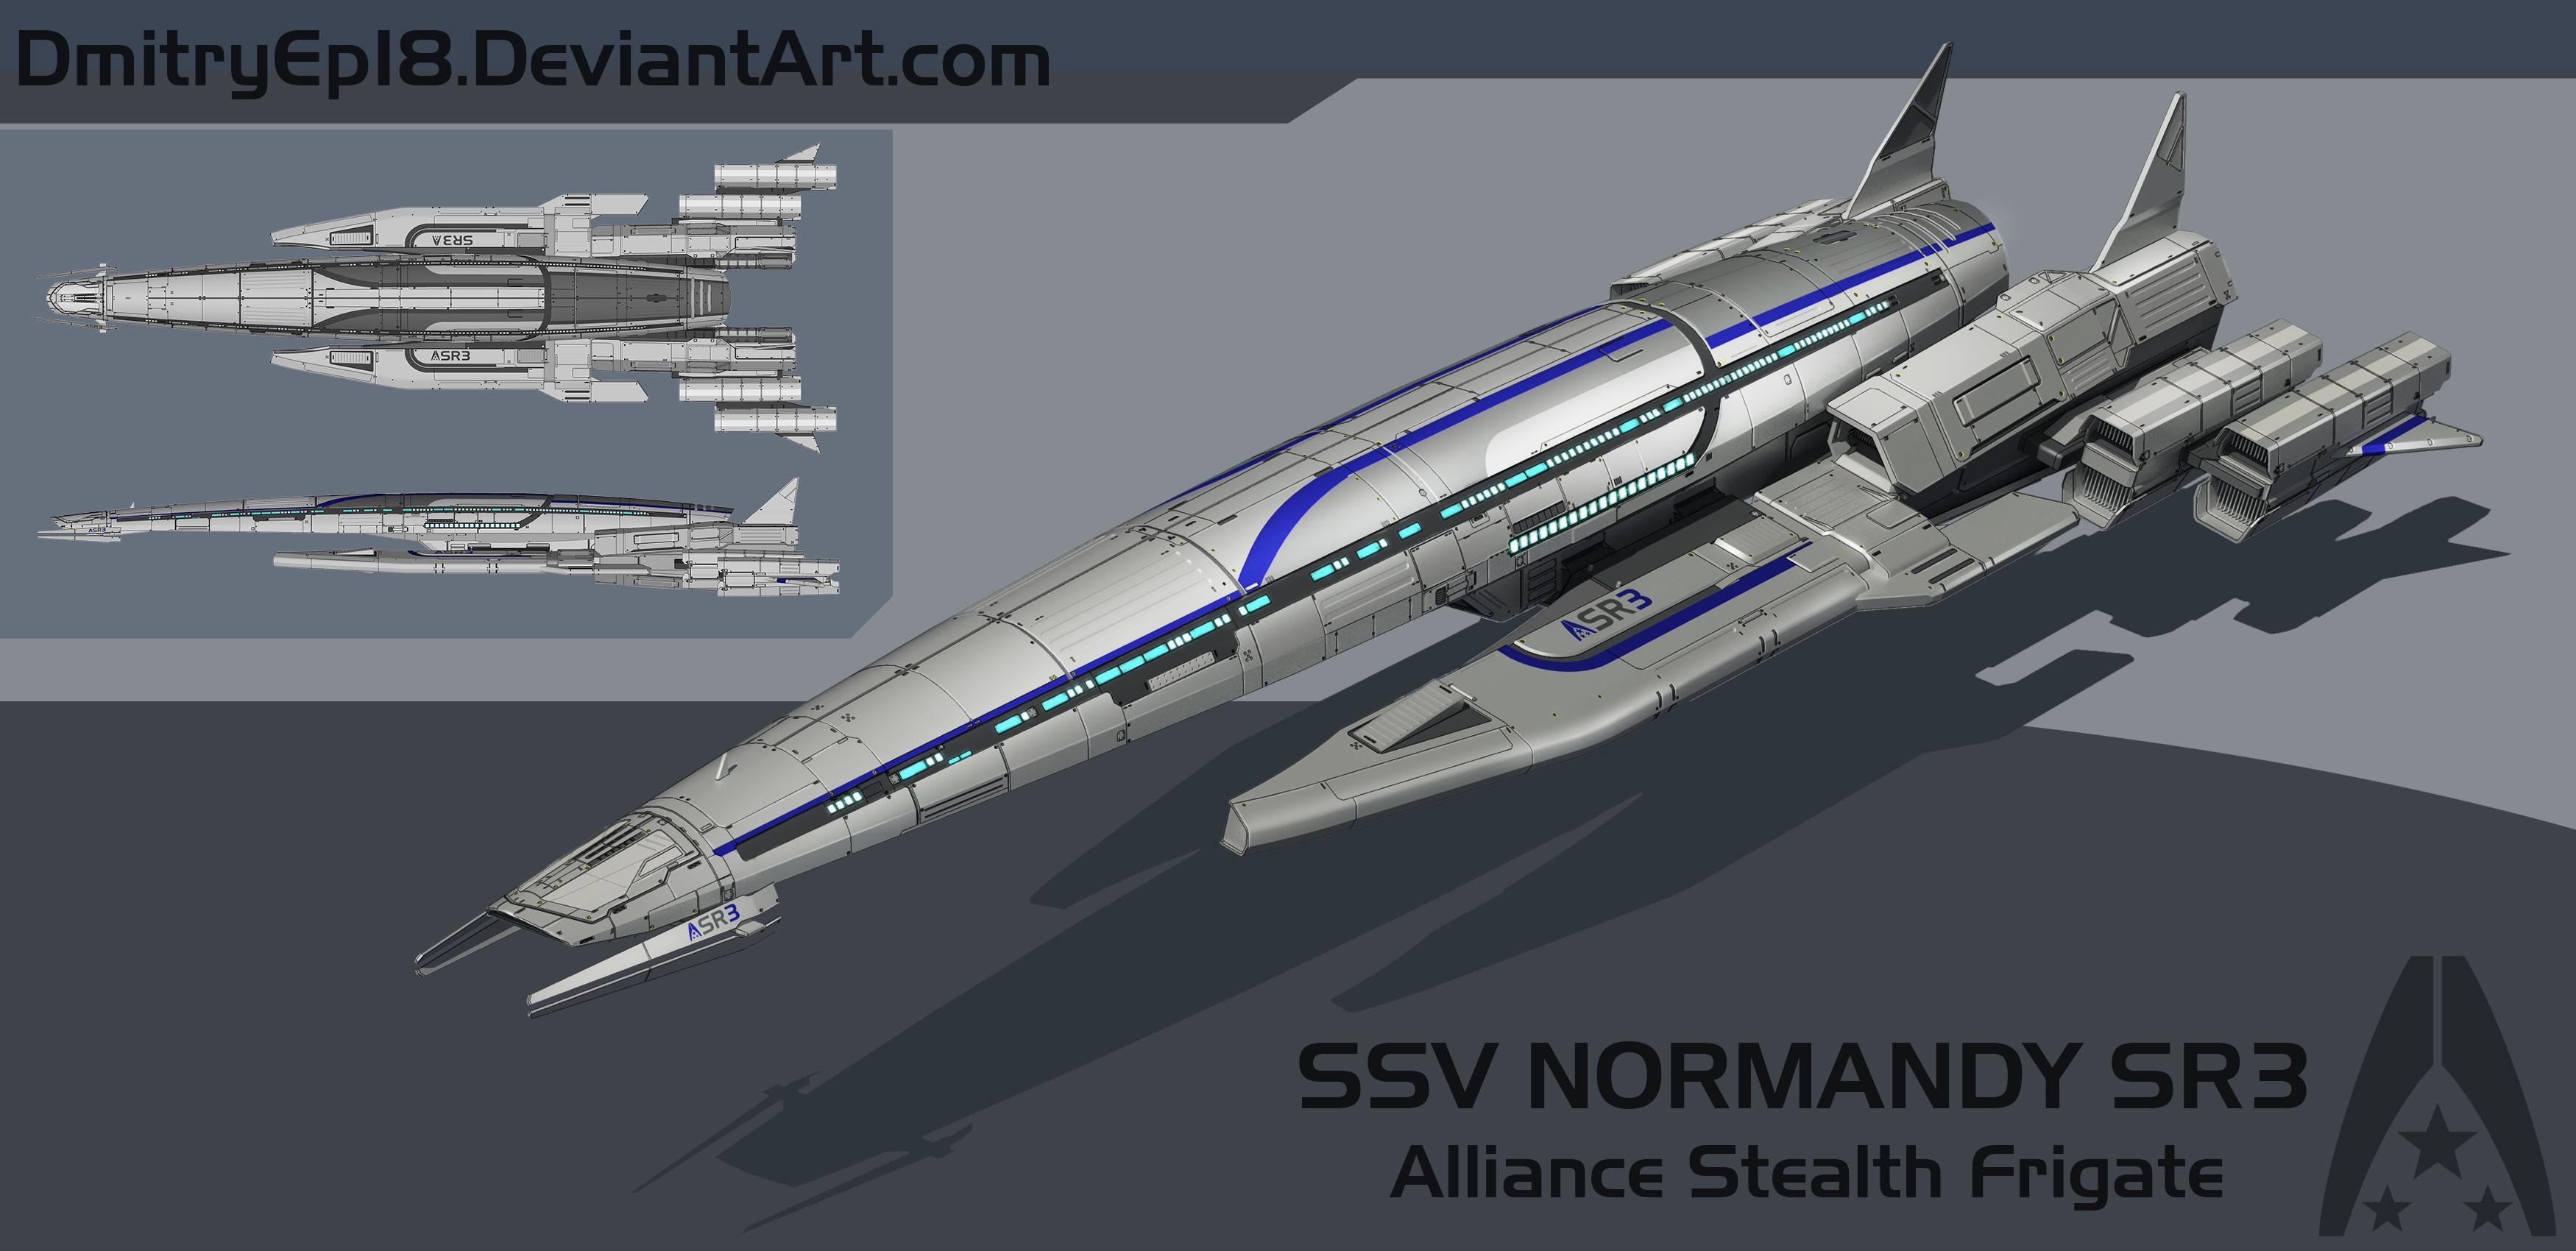 Normandy SR3 Concept By DmitryEp18 On DeviantArt